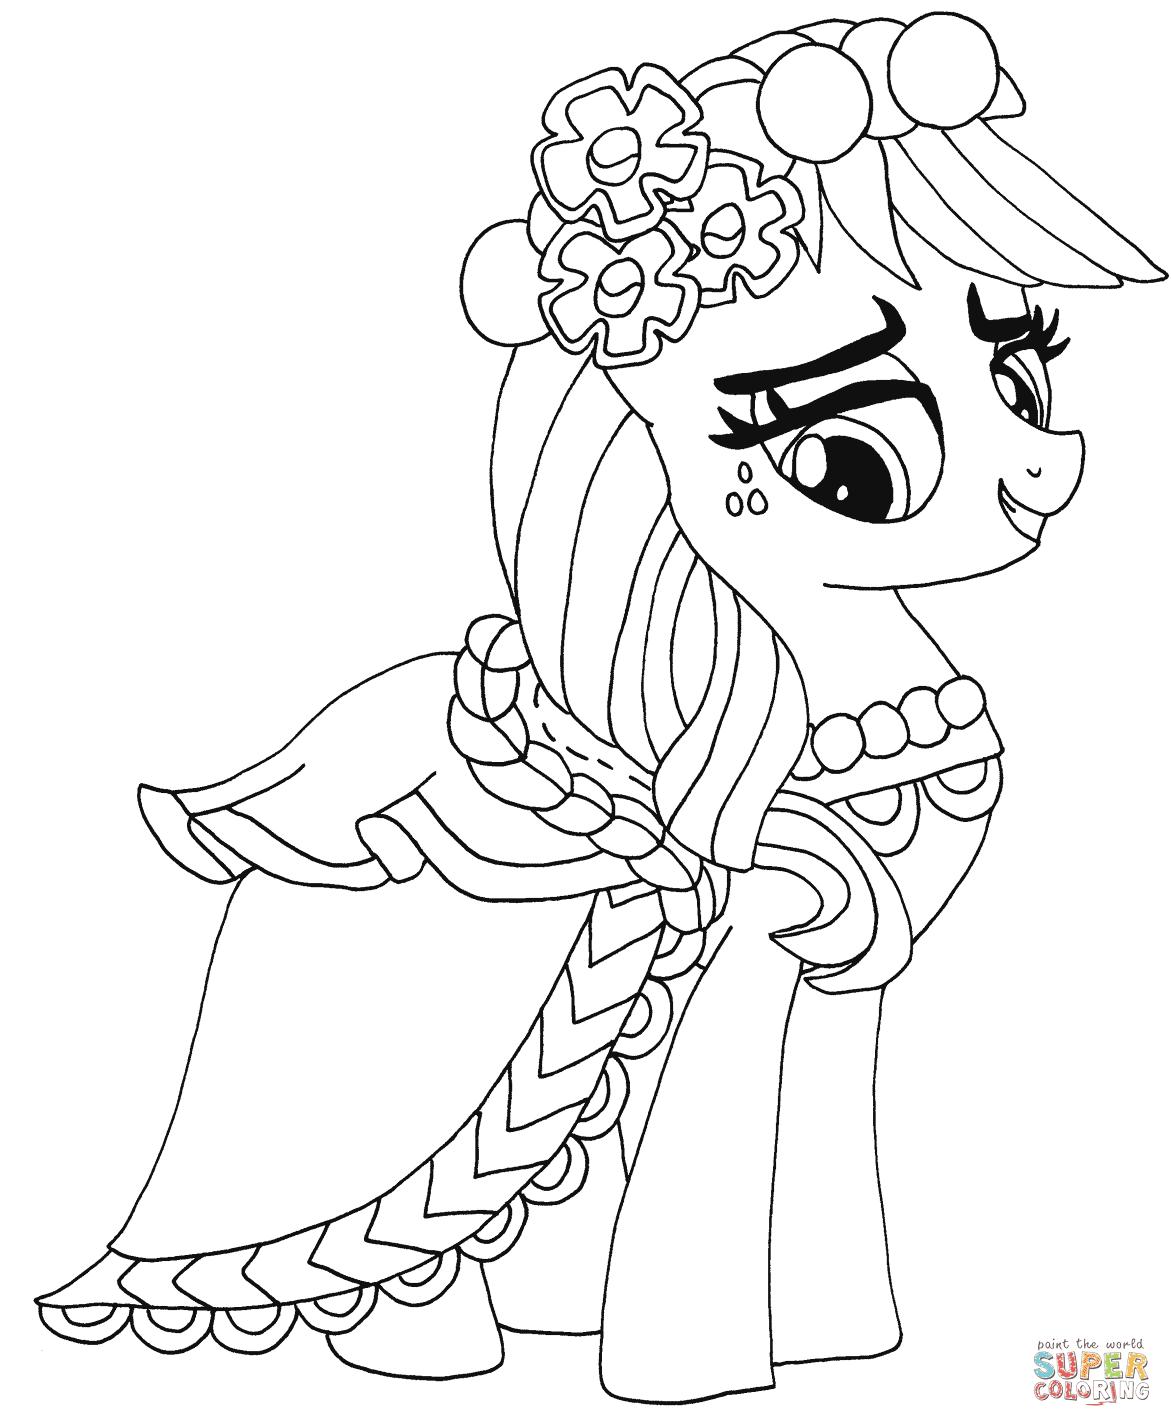 Klick das Bild My Little Pony Applejack